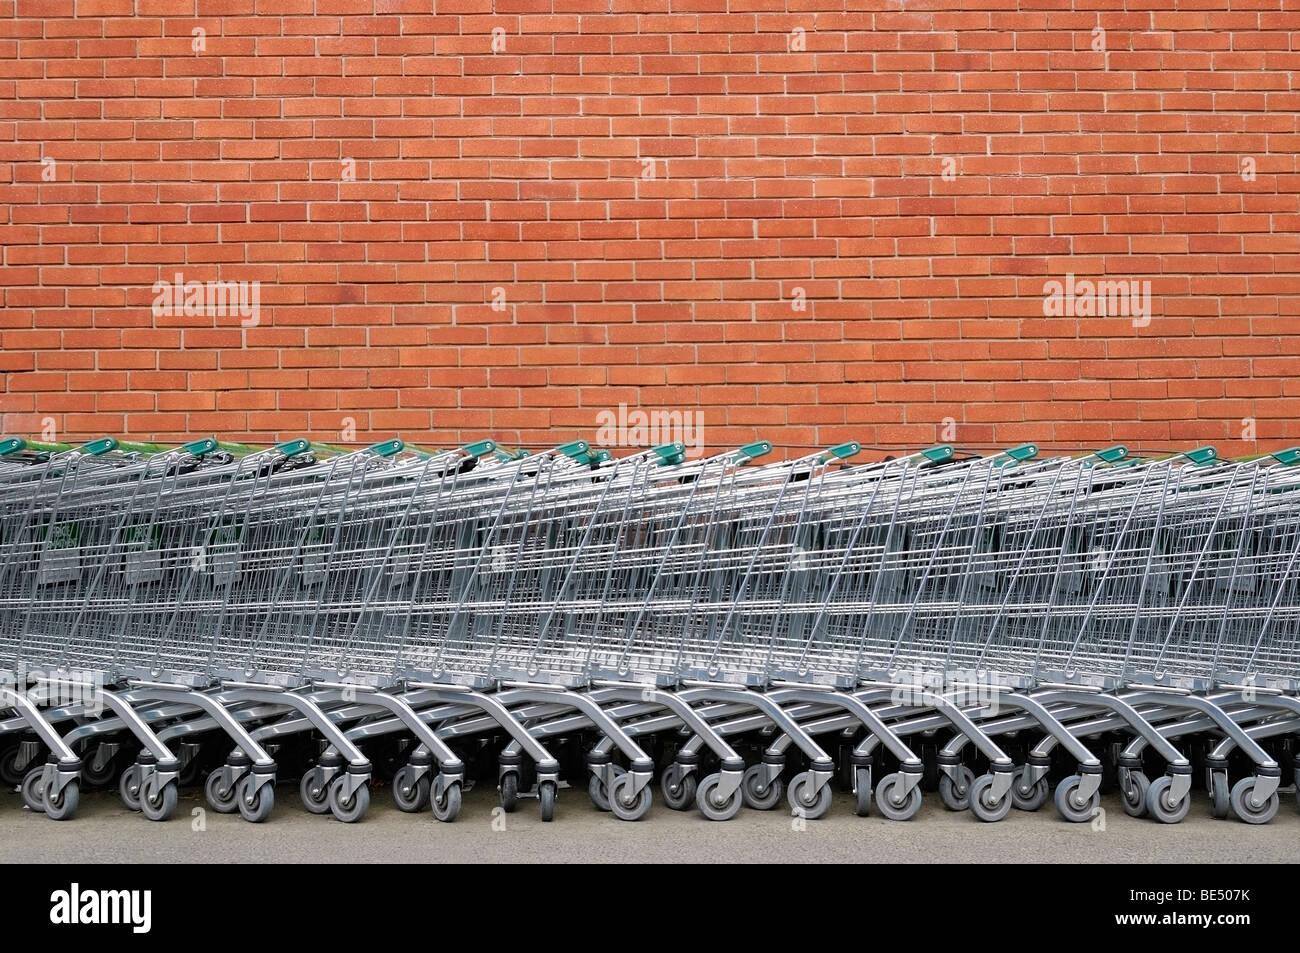 Shopping Trolleys Outside a Supermarket. - Stock Image